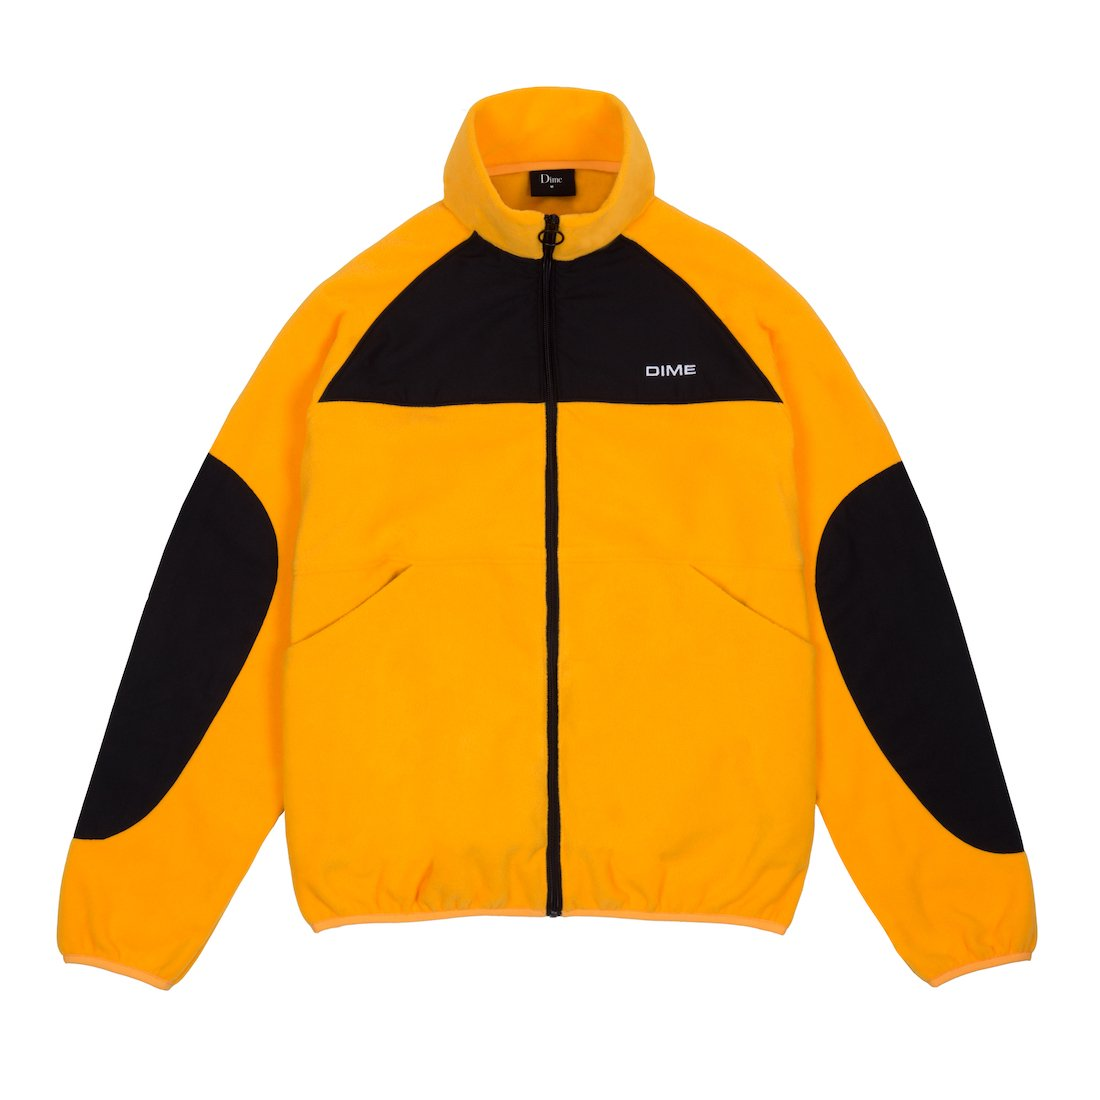 【Dime】Polar Fleece Track Jacket - Gold/Black